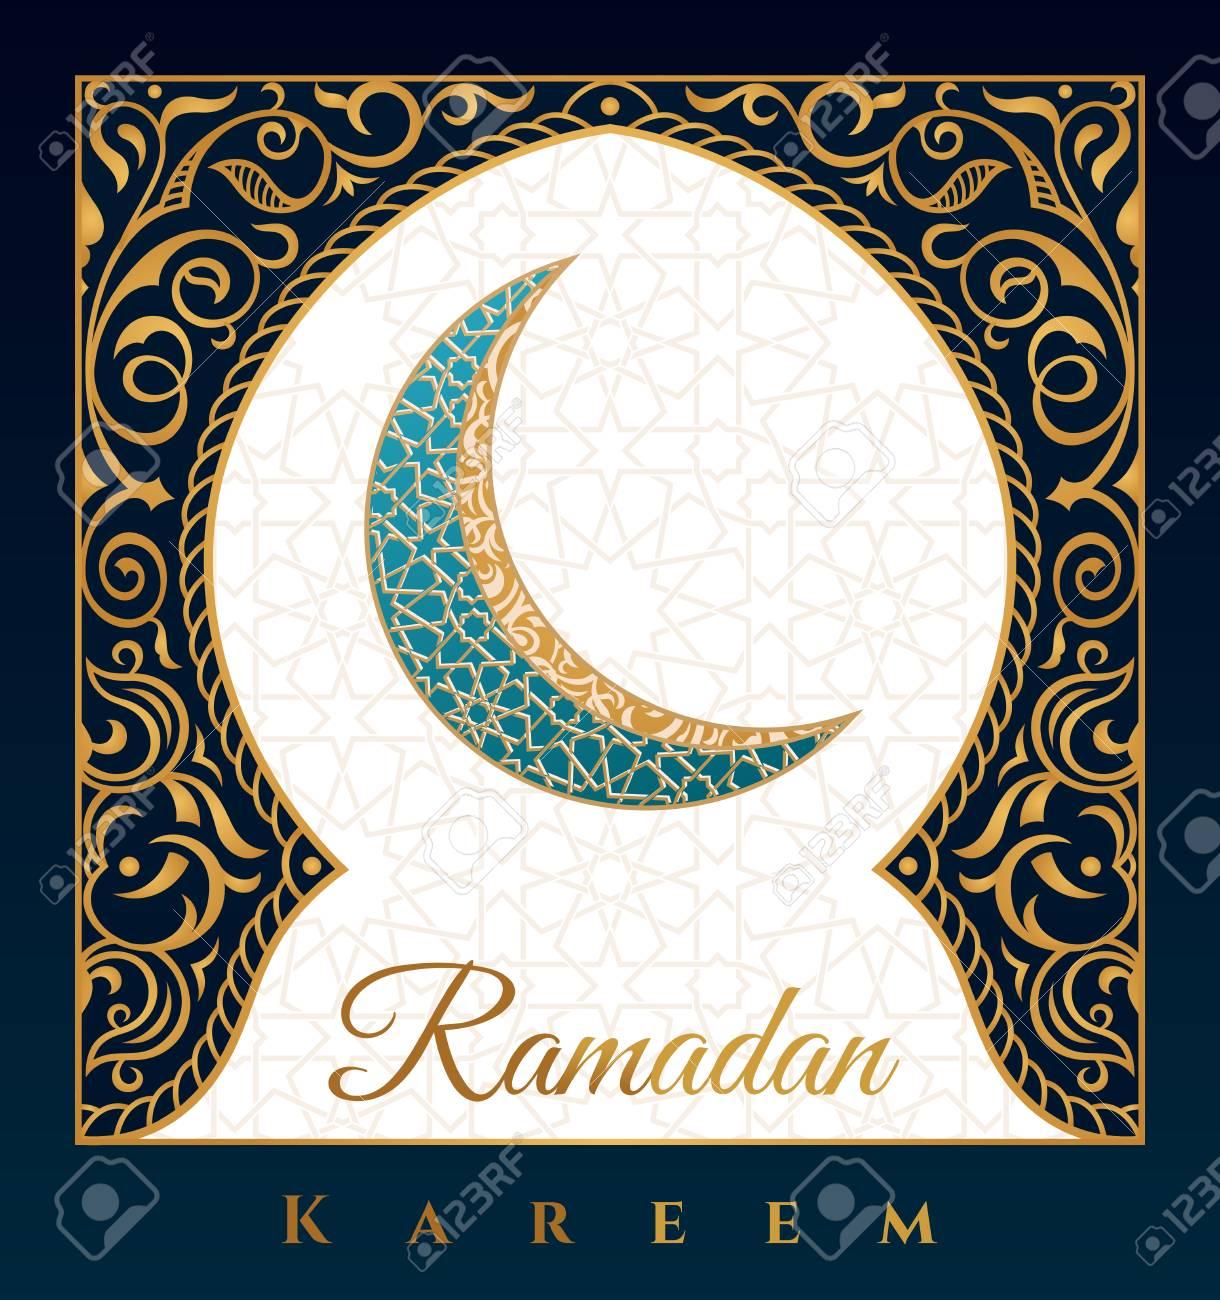 Ramadan Kareem greeting background islamic symbol crescent with